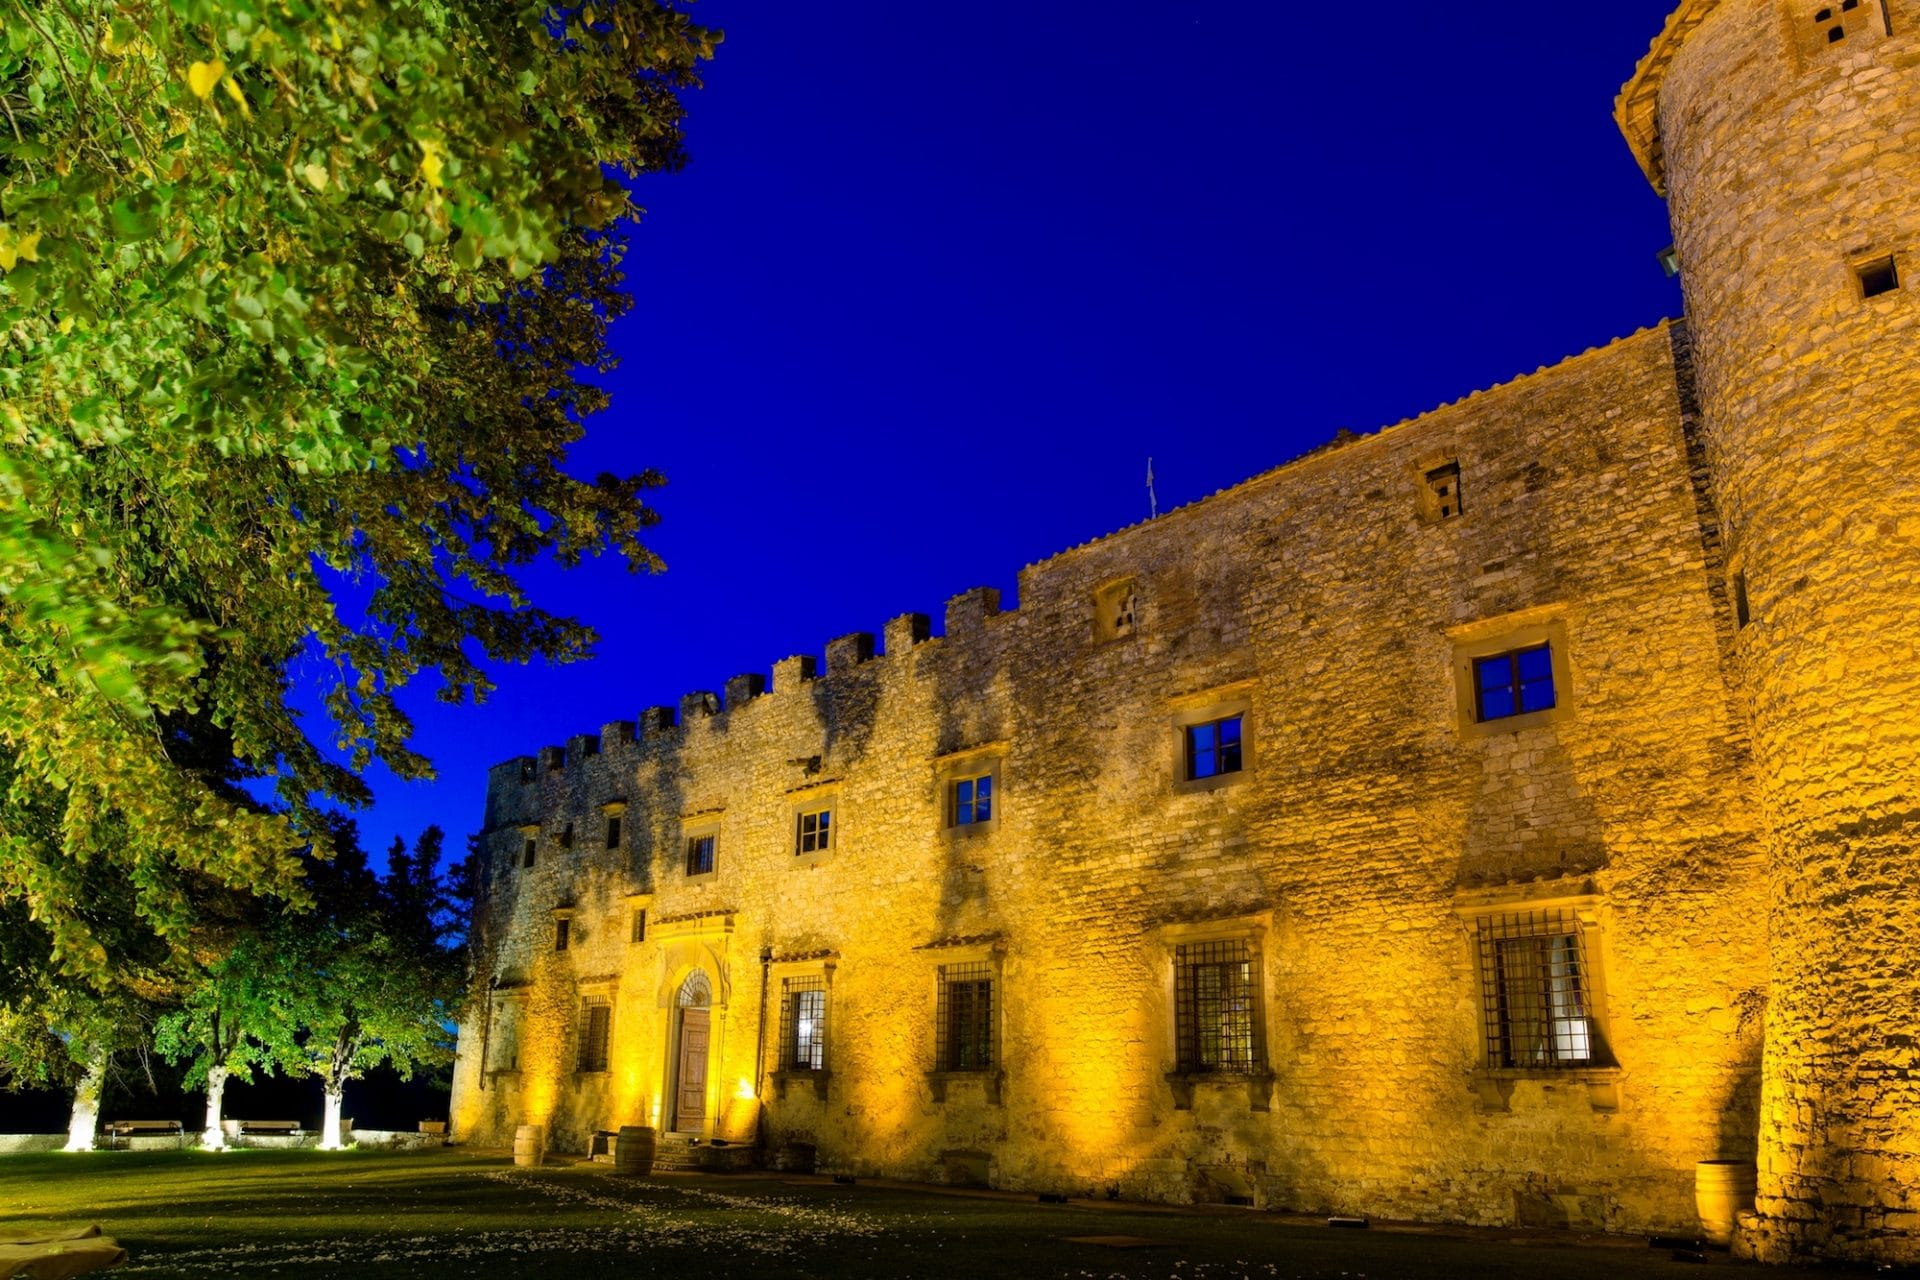 Castello castle di Meleto Kaleydo entertainment